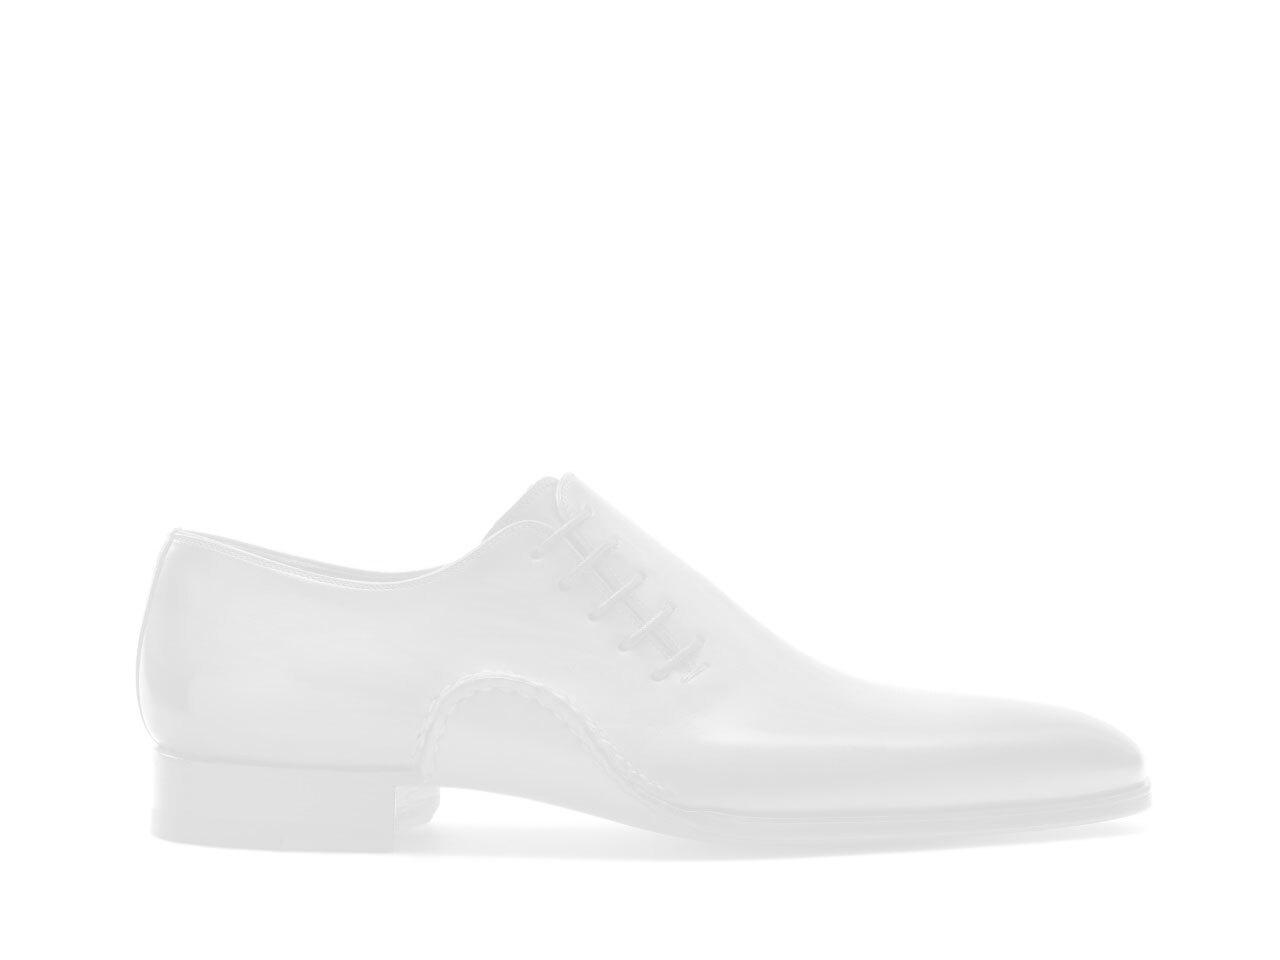 Green business casual socks - Magnanni